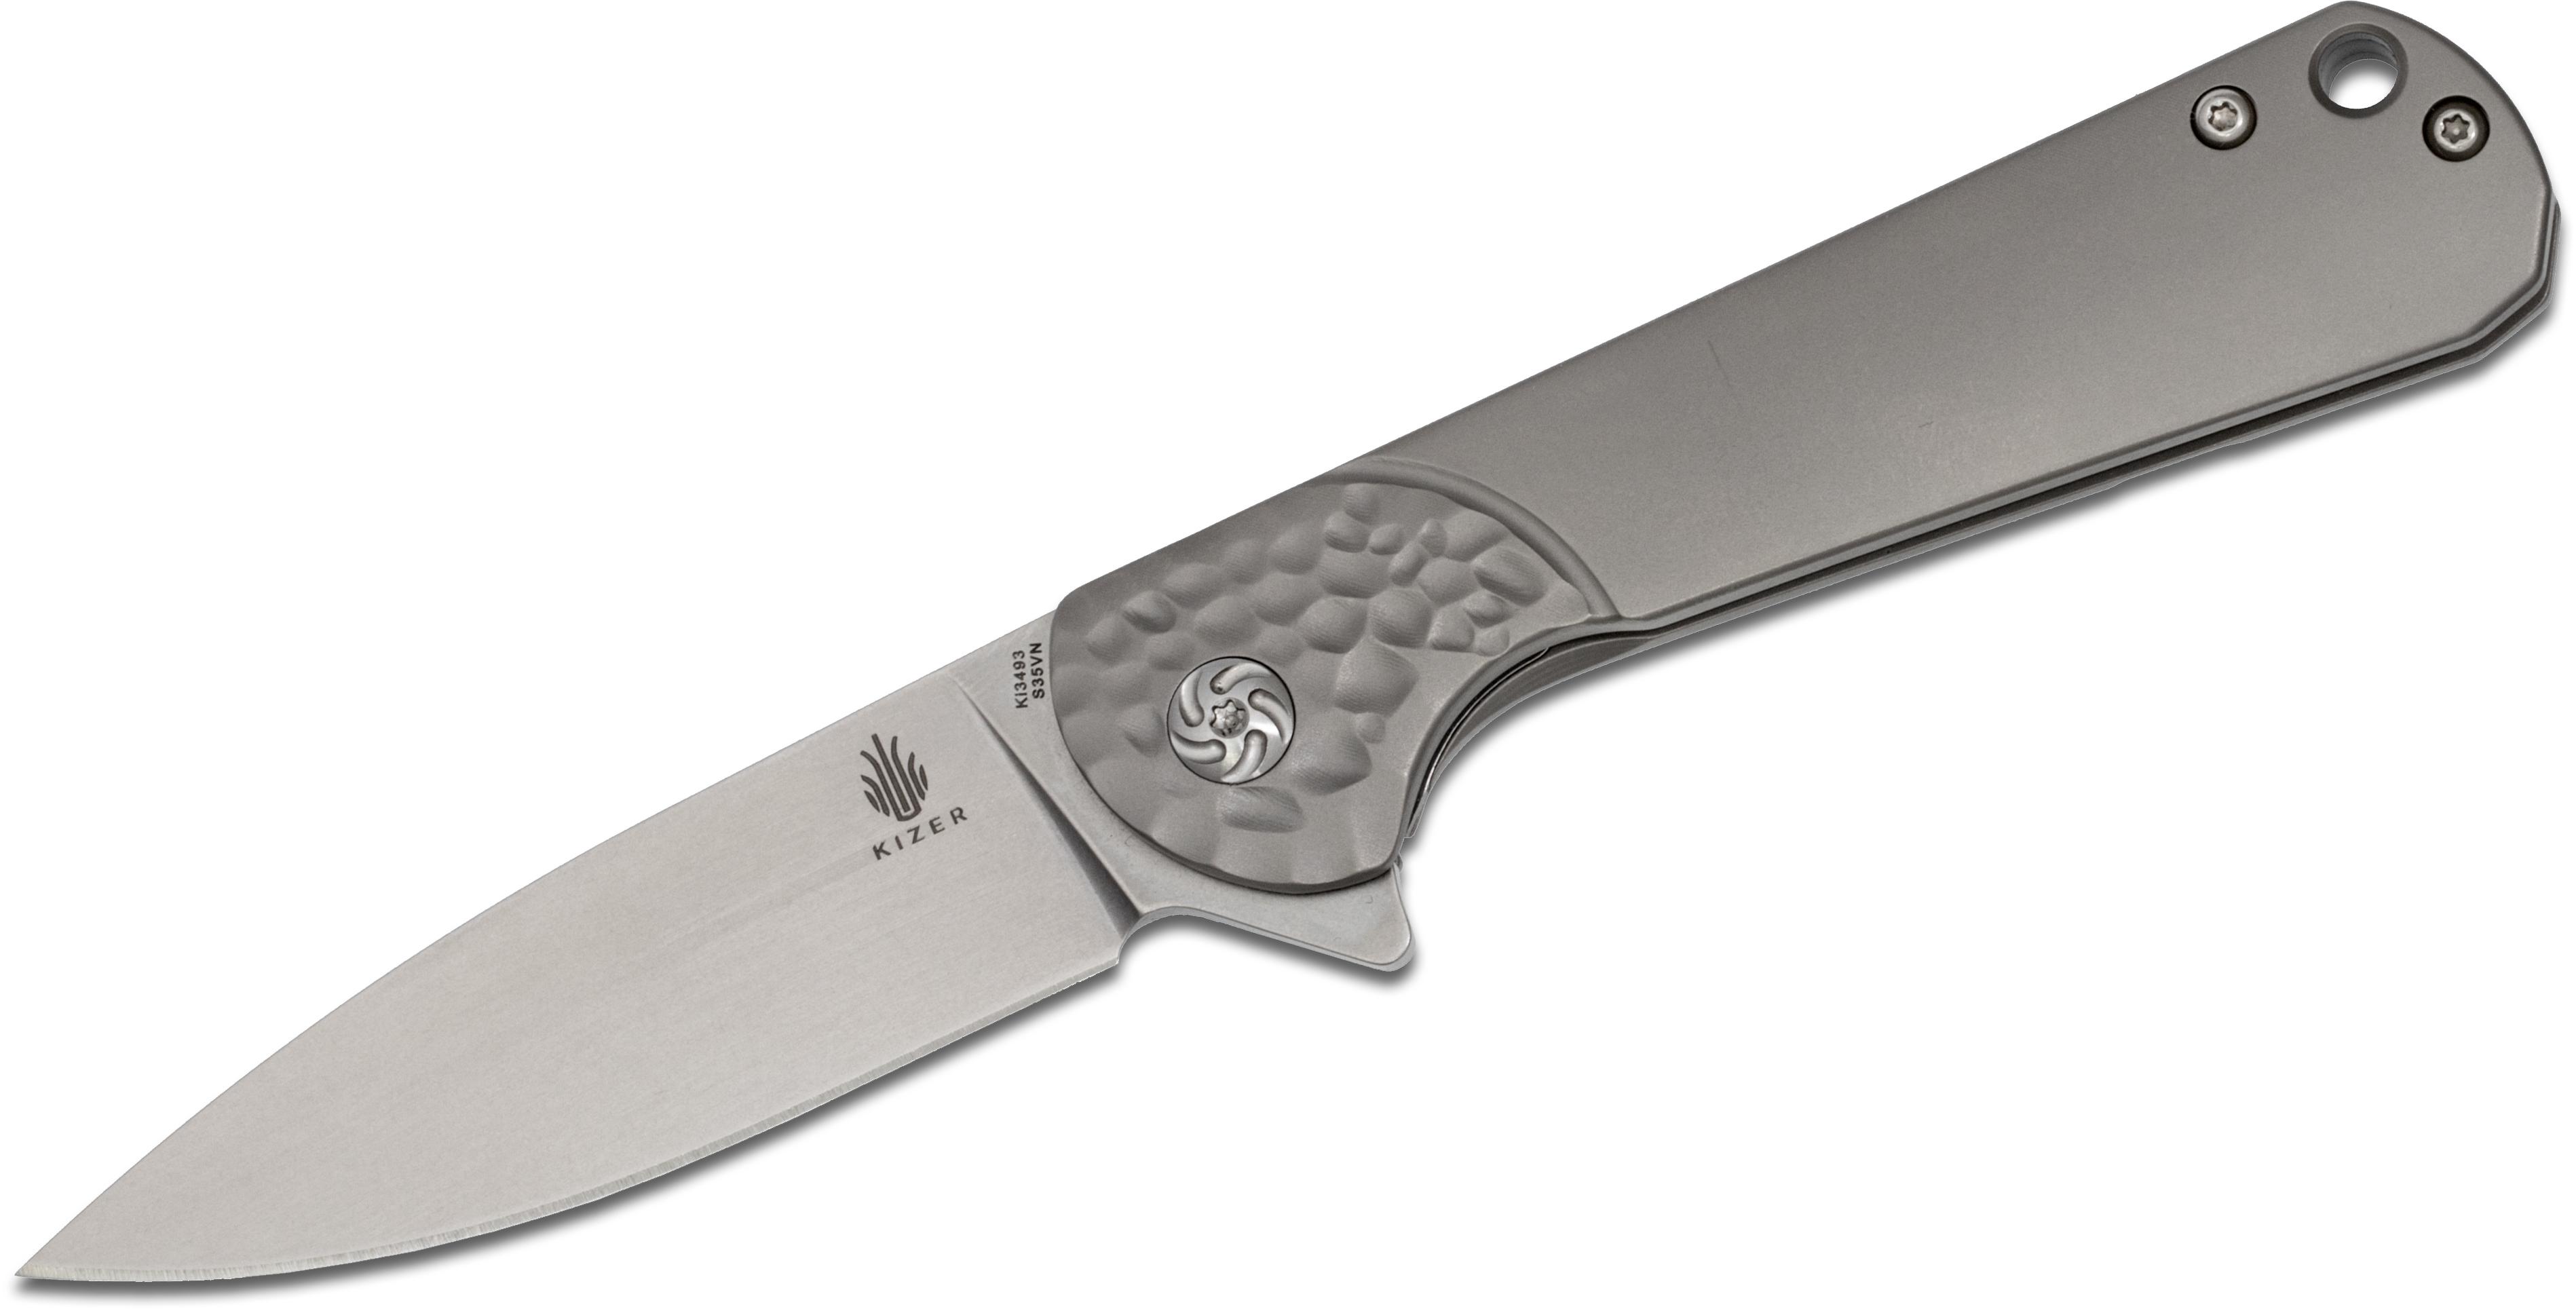 Kizer Cutlery Ki3493 Envoy Flipper 2.99 inch S35VN Spear Point Blade, Milled Titanium Handles